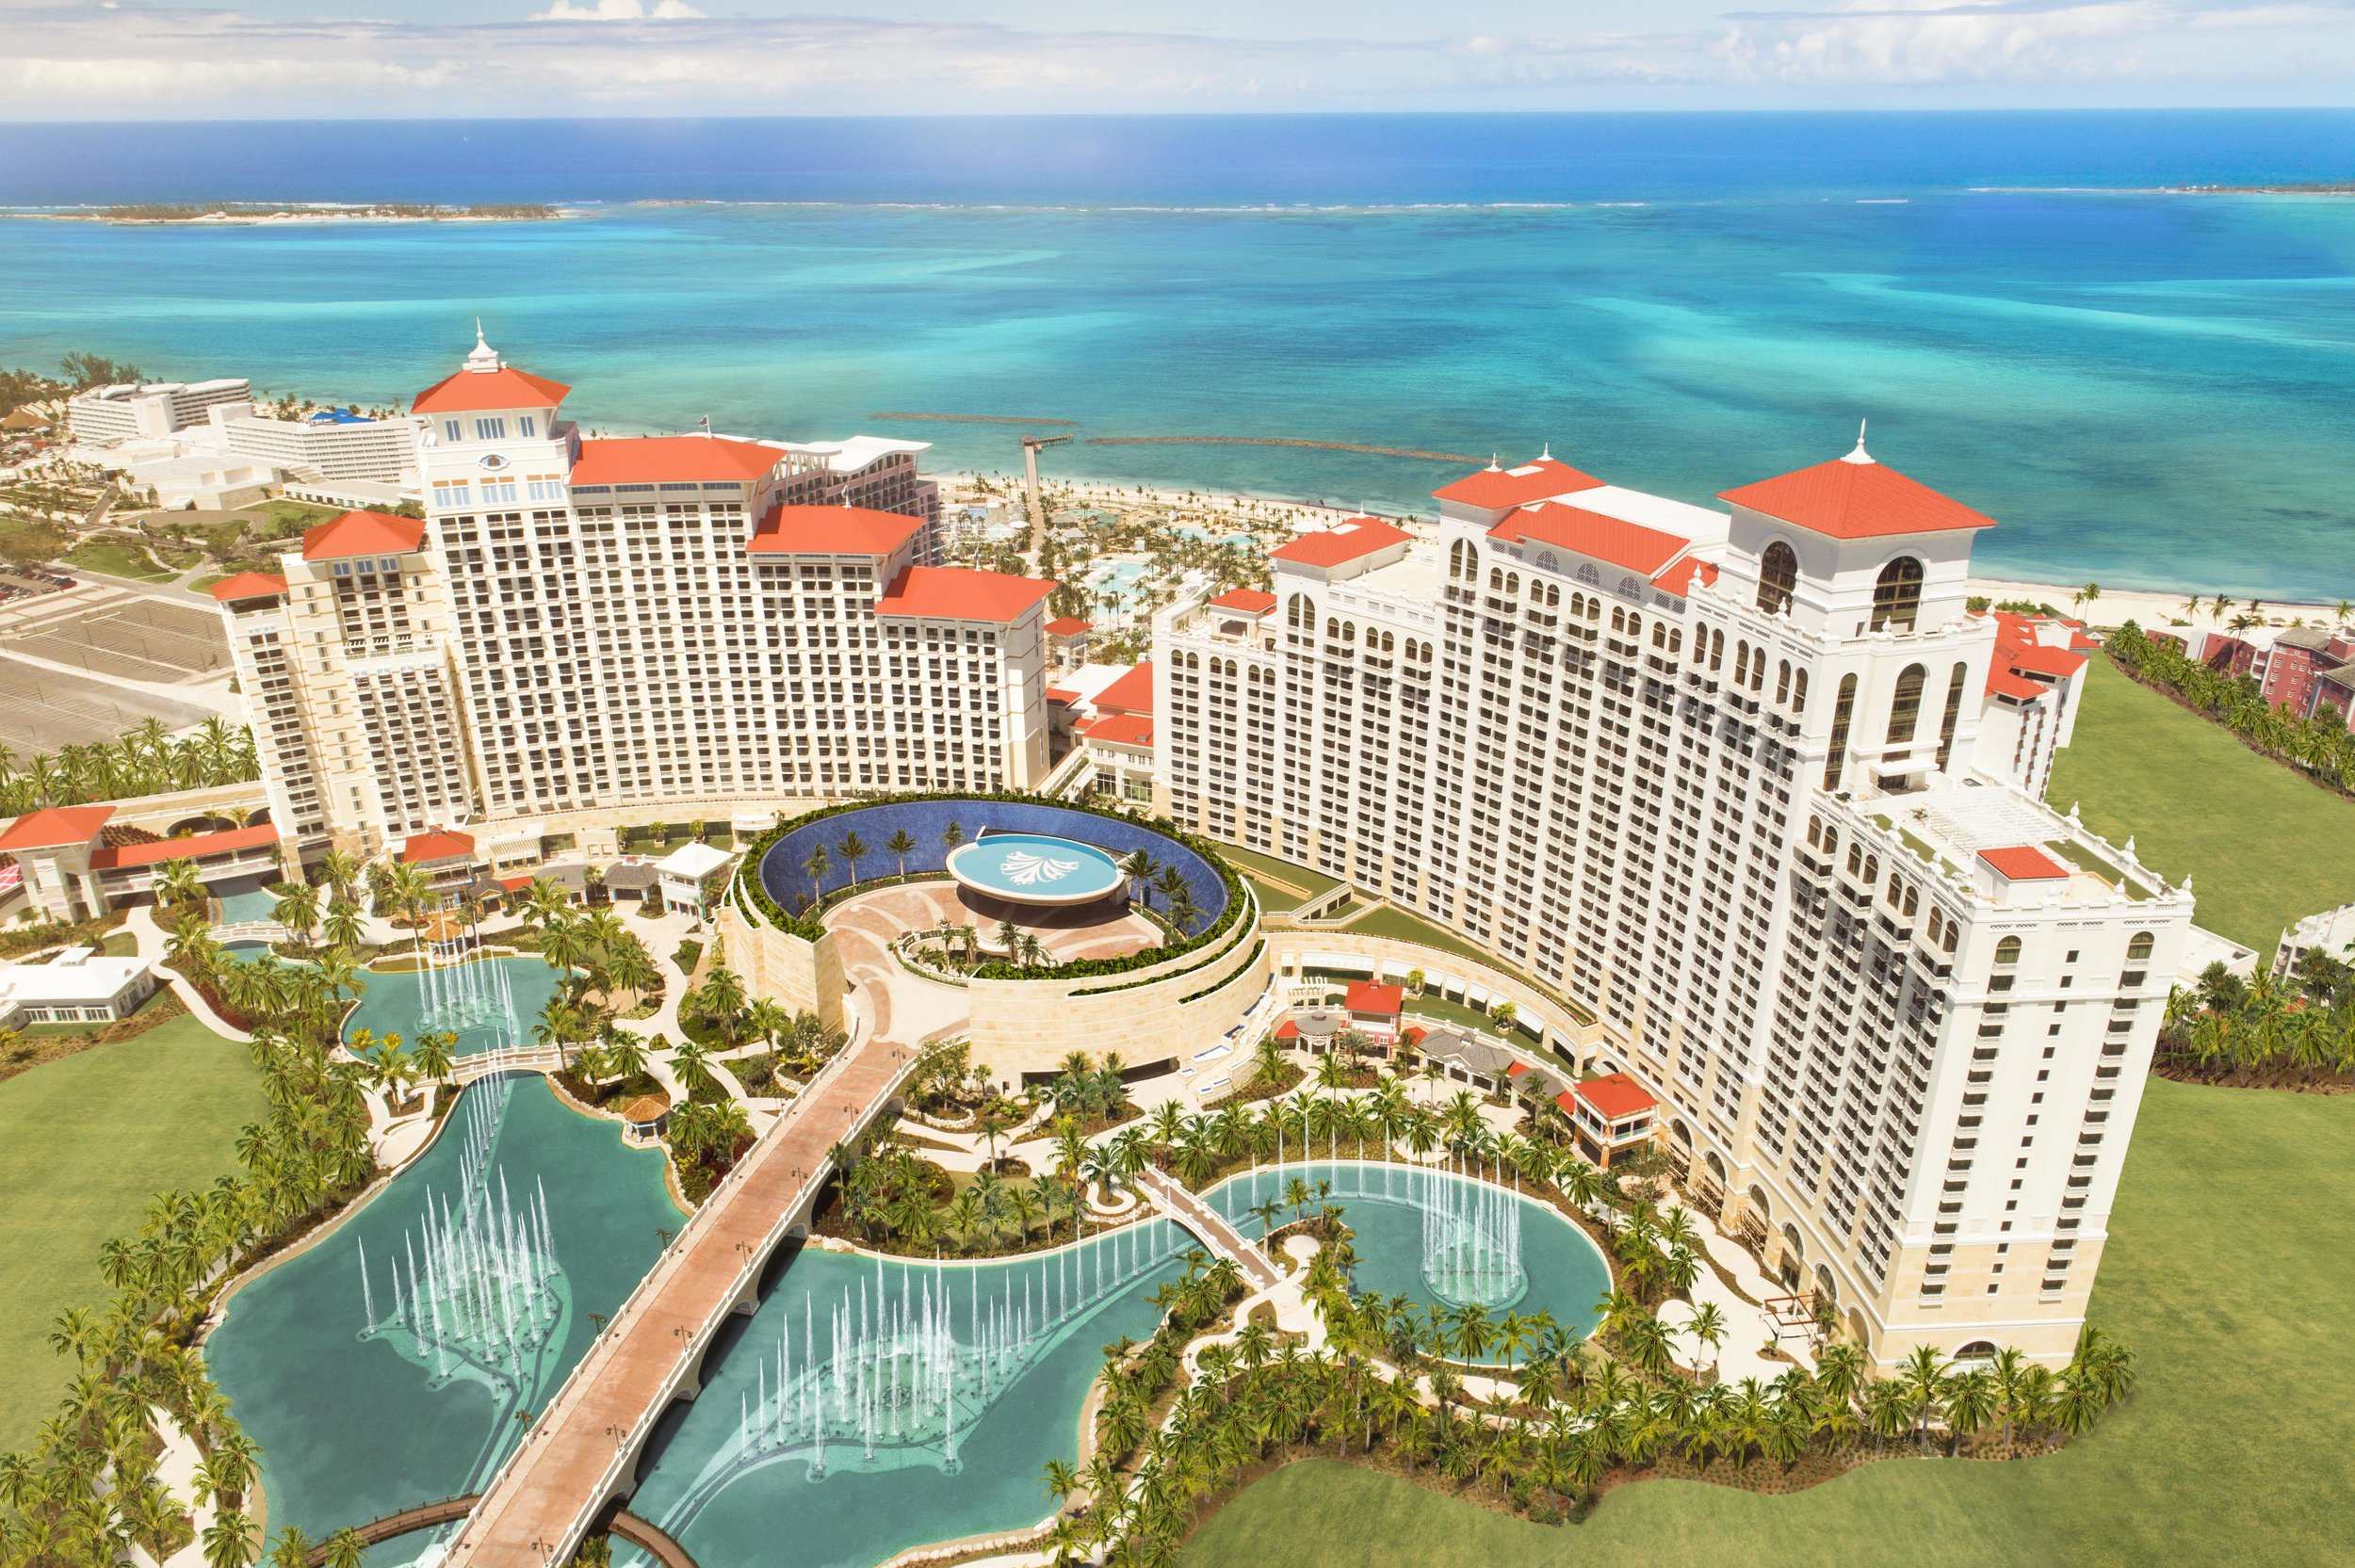 Hospitality & Resort - PDG Delivers 5-star Luxury Resorts